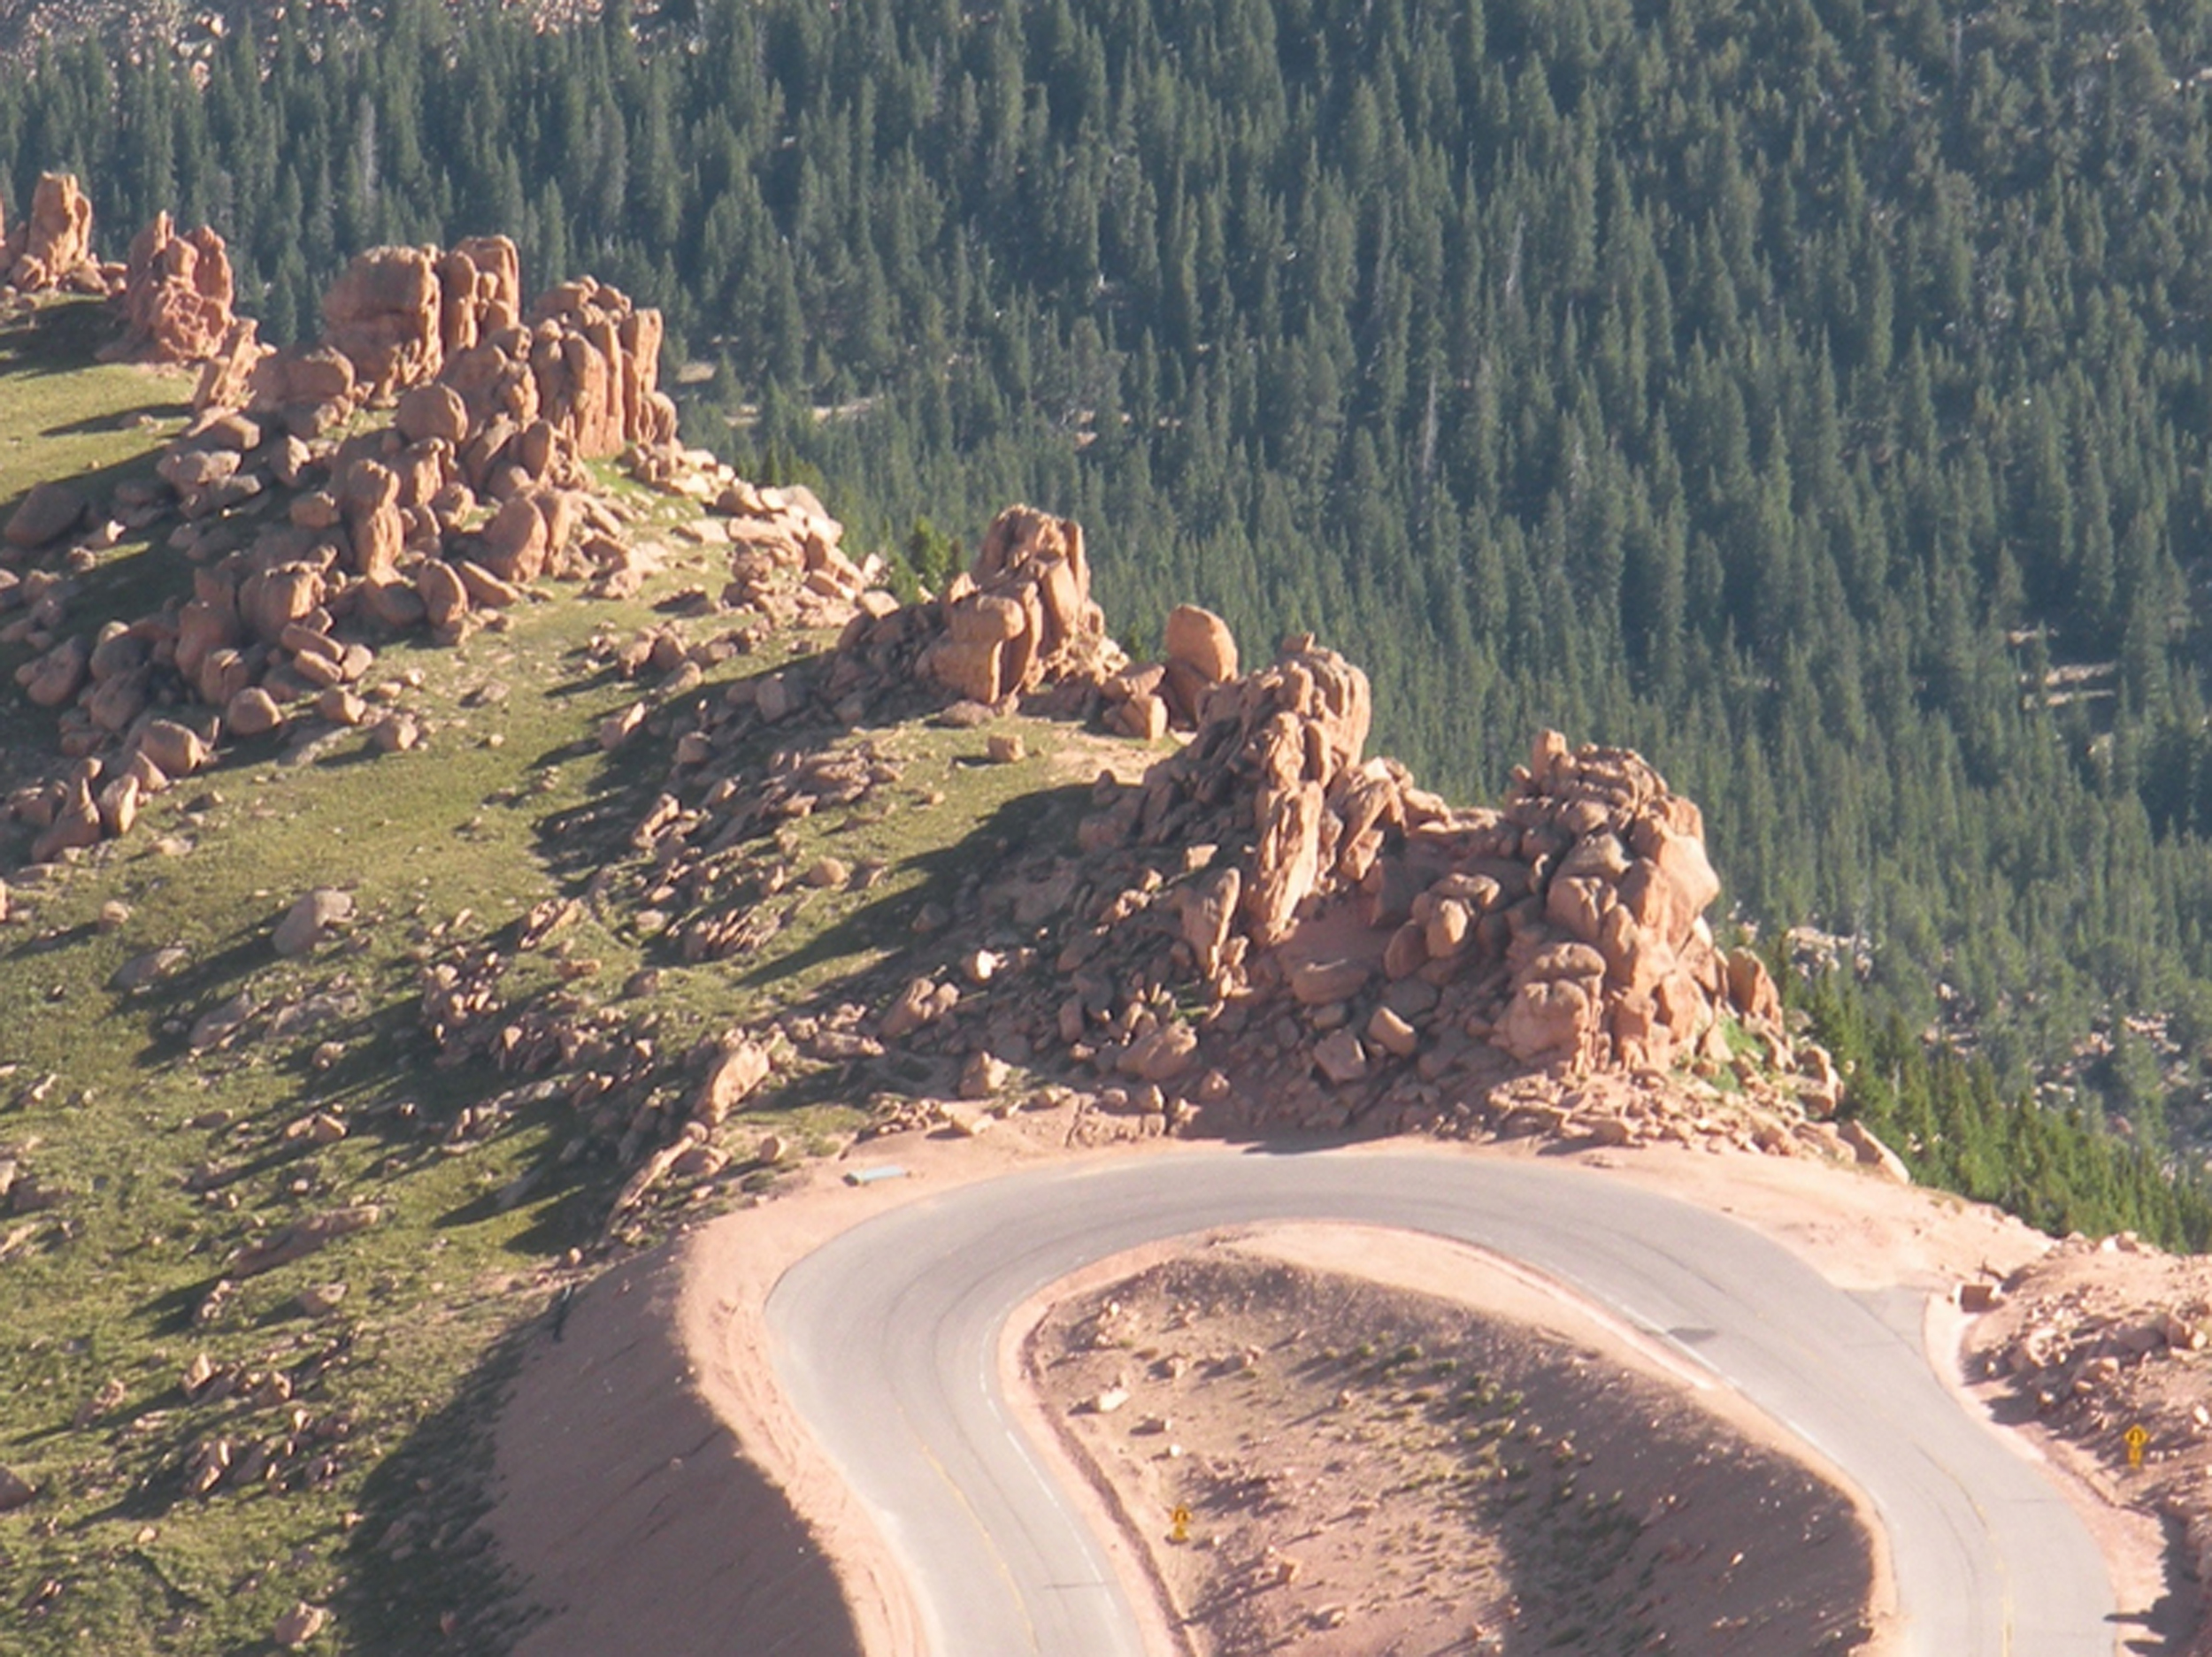 2011-08-04_20_00_00_Susie_Fire_in_the_Adobe_Range_west_of_Elko_Nevada2500wide.jpg